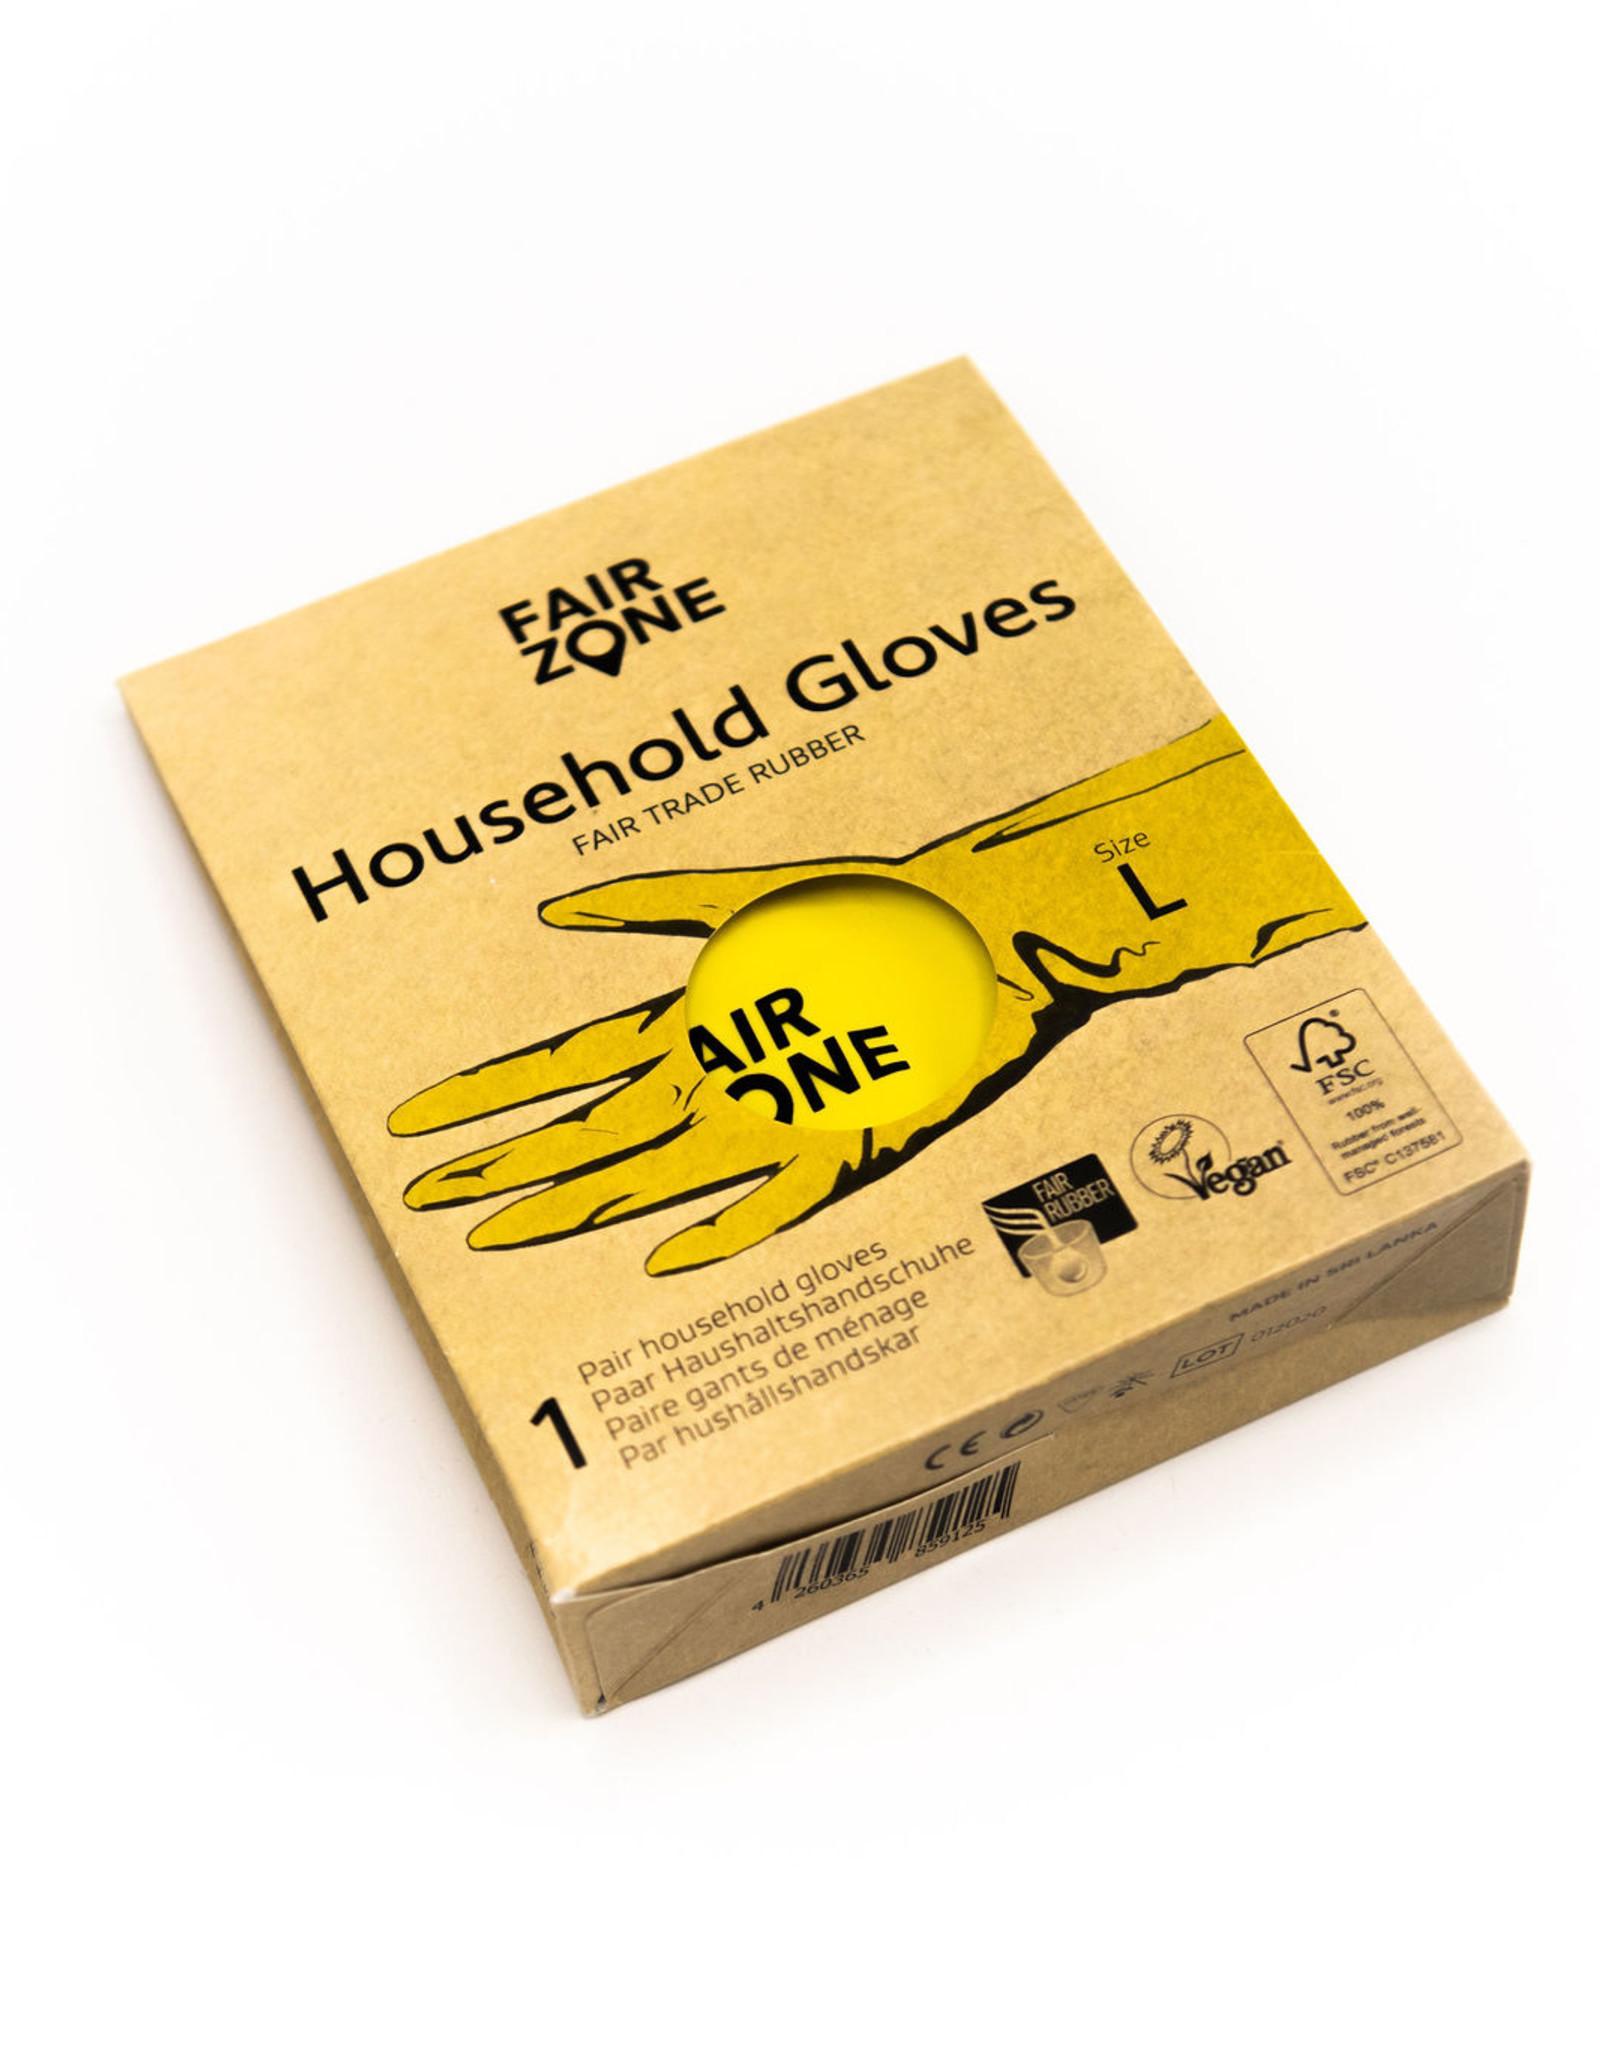 Fairsquared Huishoudhandschoenen FAIR